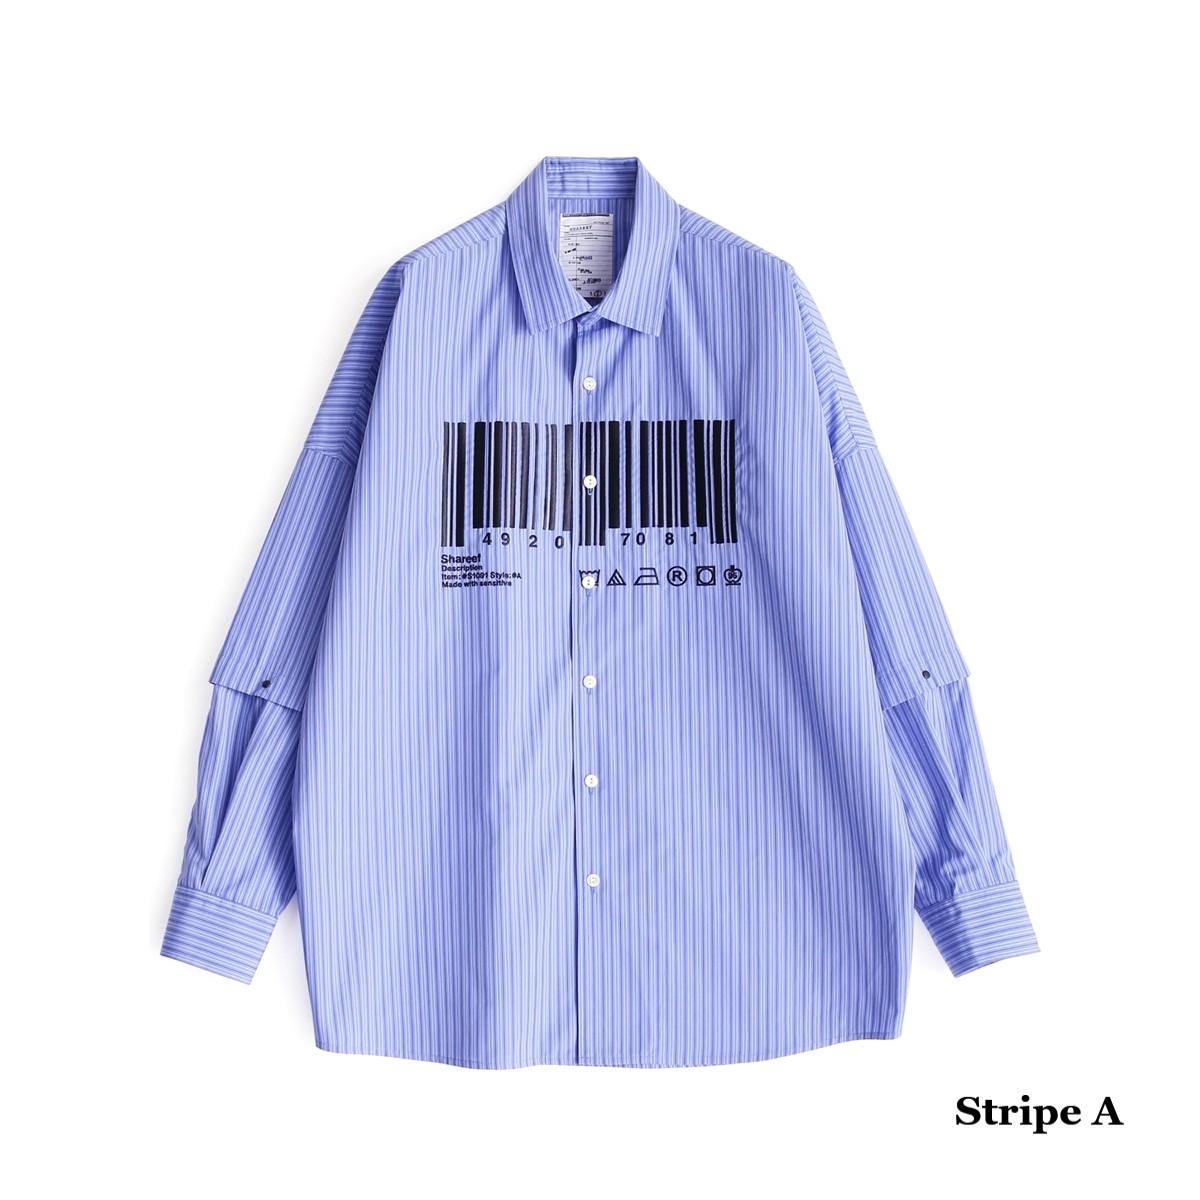 "SHAREEF ""BARCODE""SEPARATE SLEEVE SHIRTS (2色 Stripe A/Stripe B) 19533004 シャリーフ バーコード セパレート ストライプ 刺繍 ビッグシルエット シャツ メンズ 送料無料"